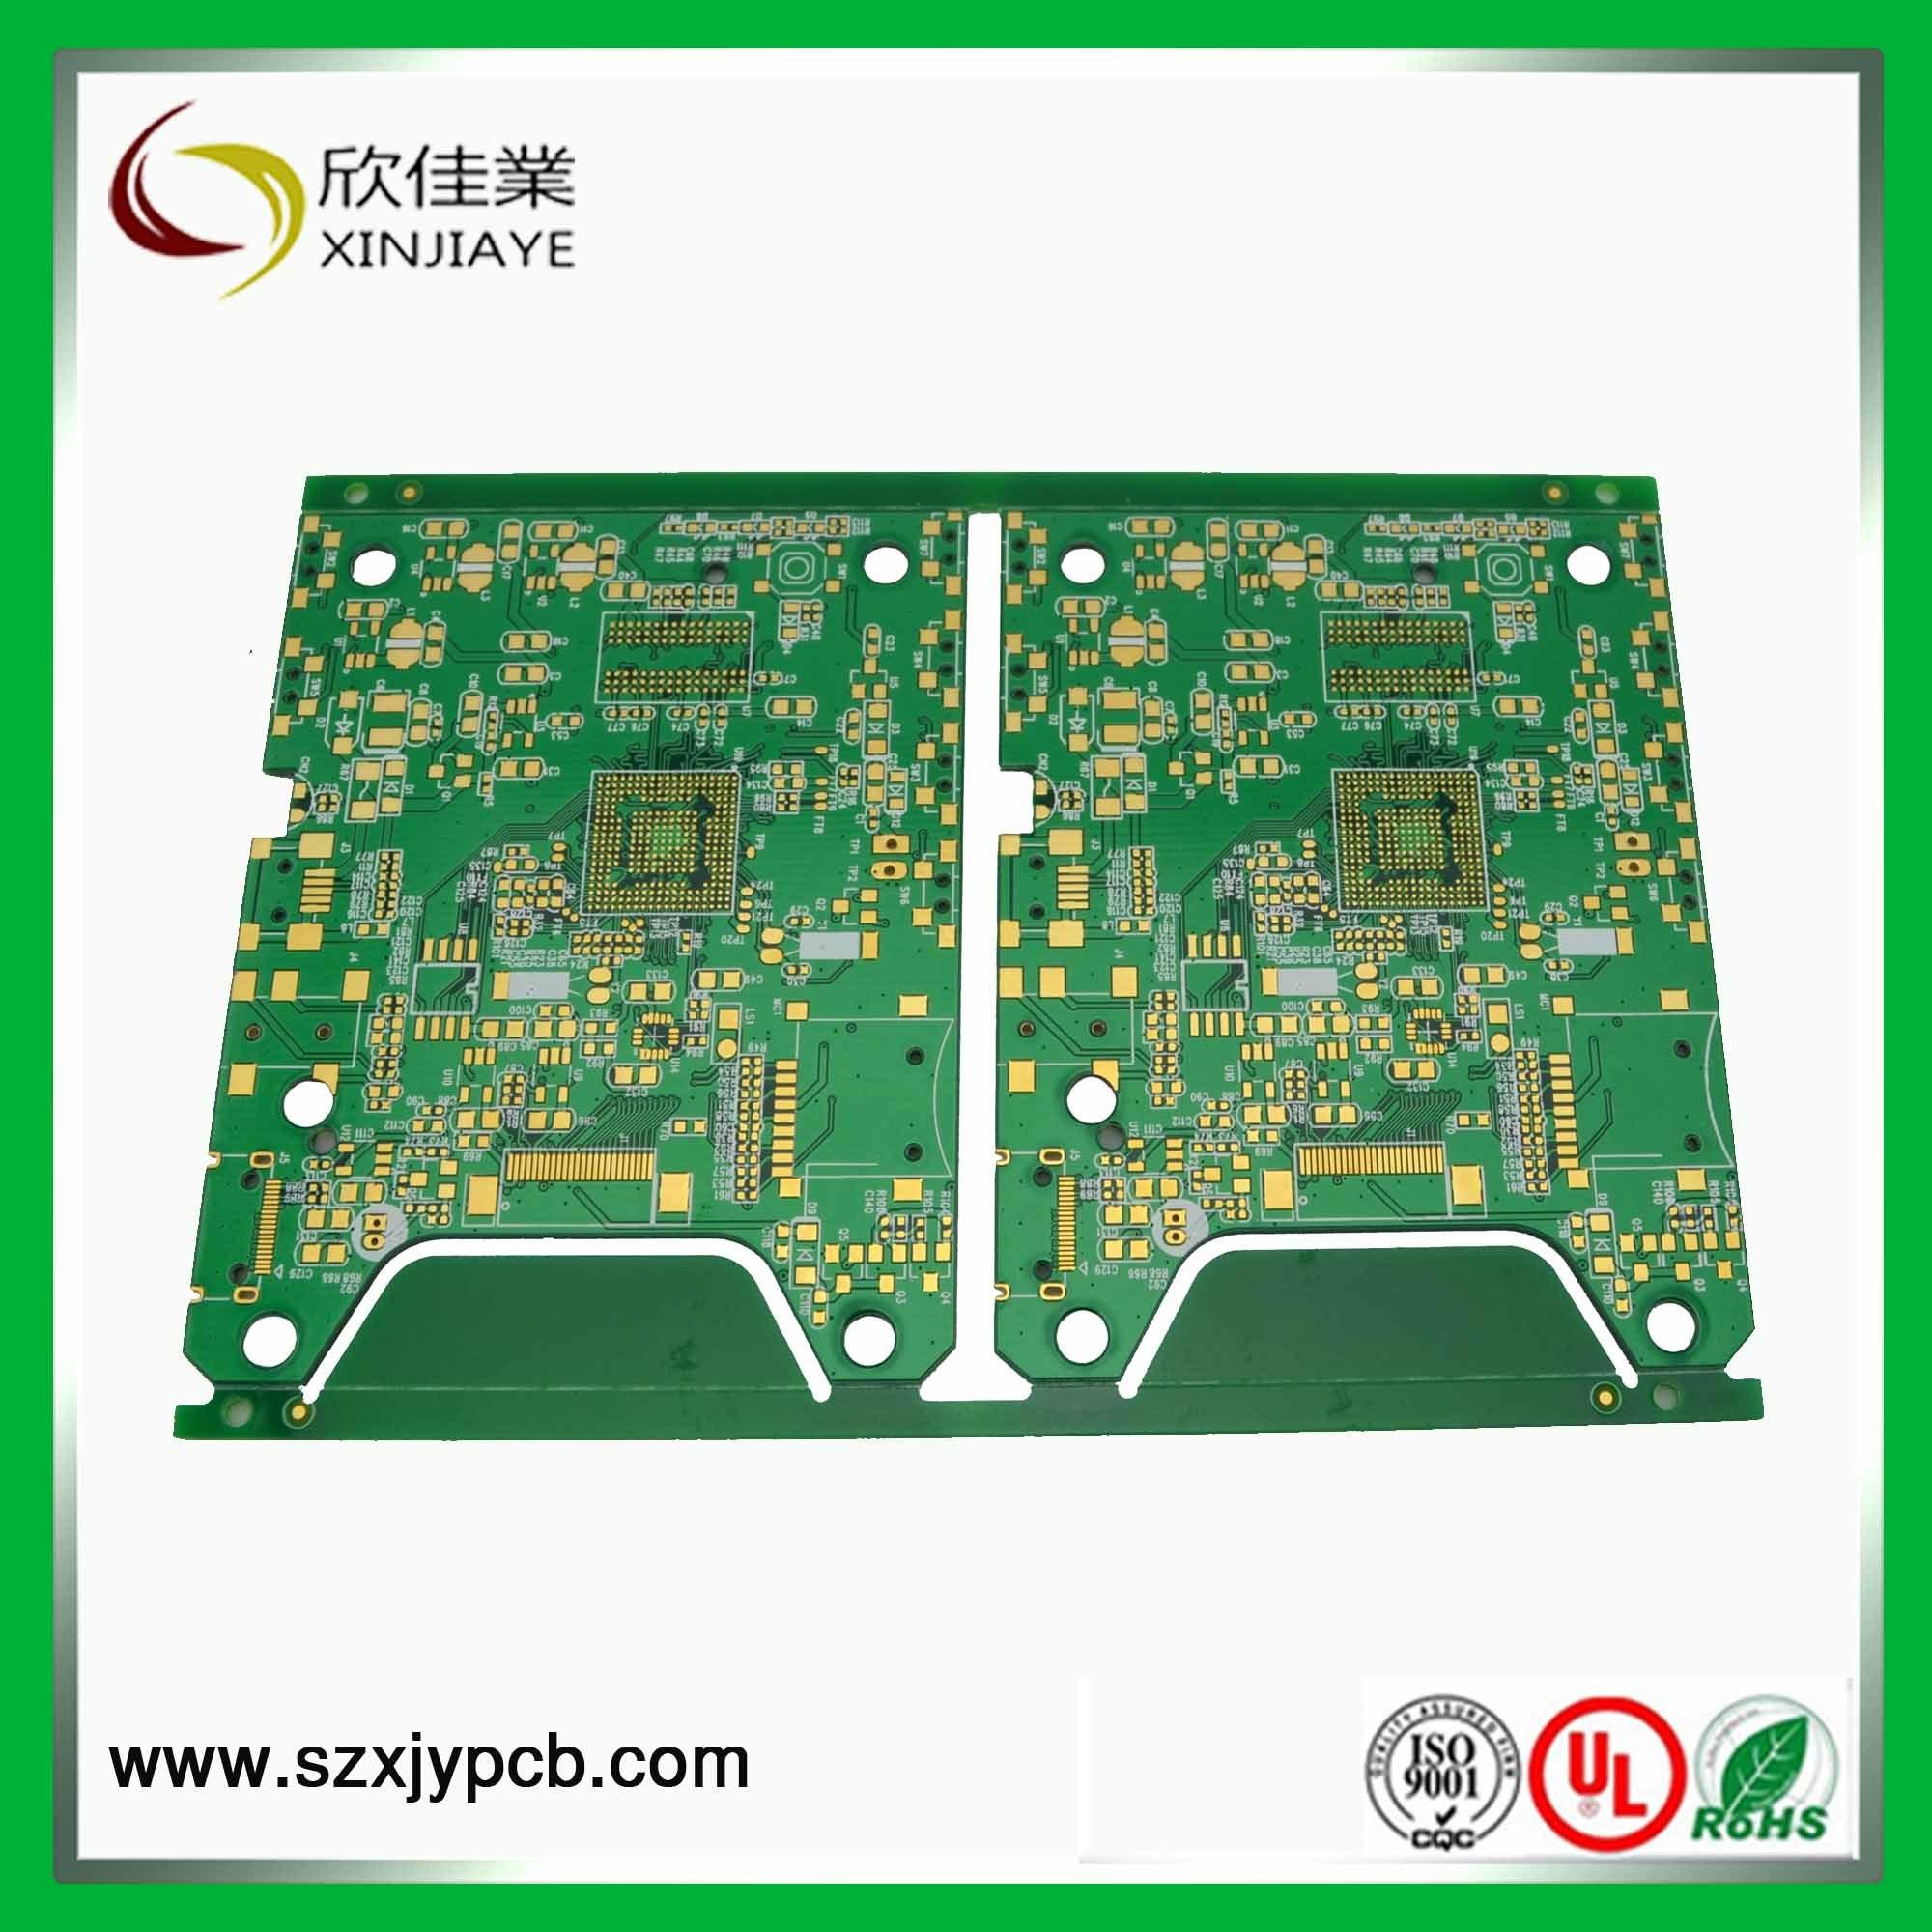 China 4 Layer Printed Circuit Board And Pcb Manufacturer Rigid Flex Boards Oem Hasl 1 Oz Copper